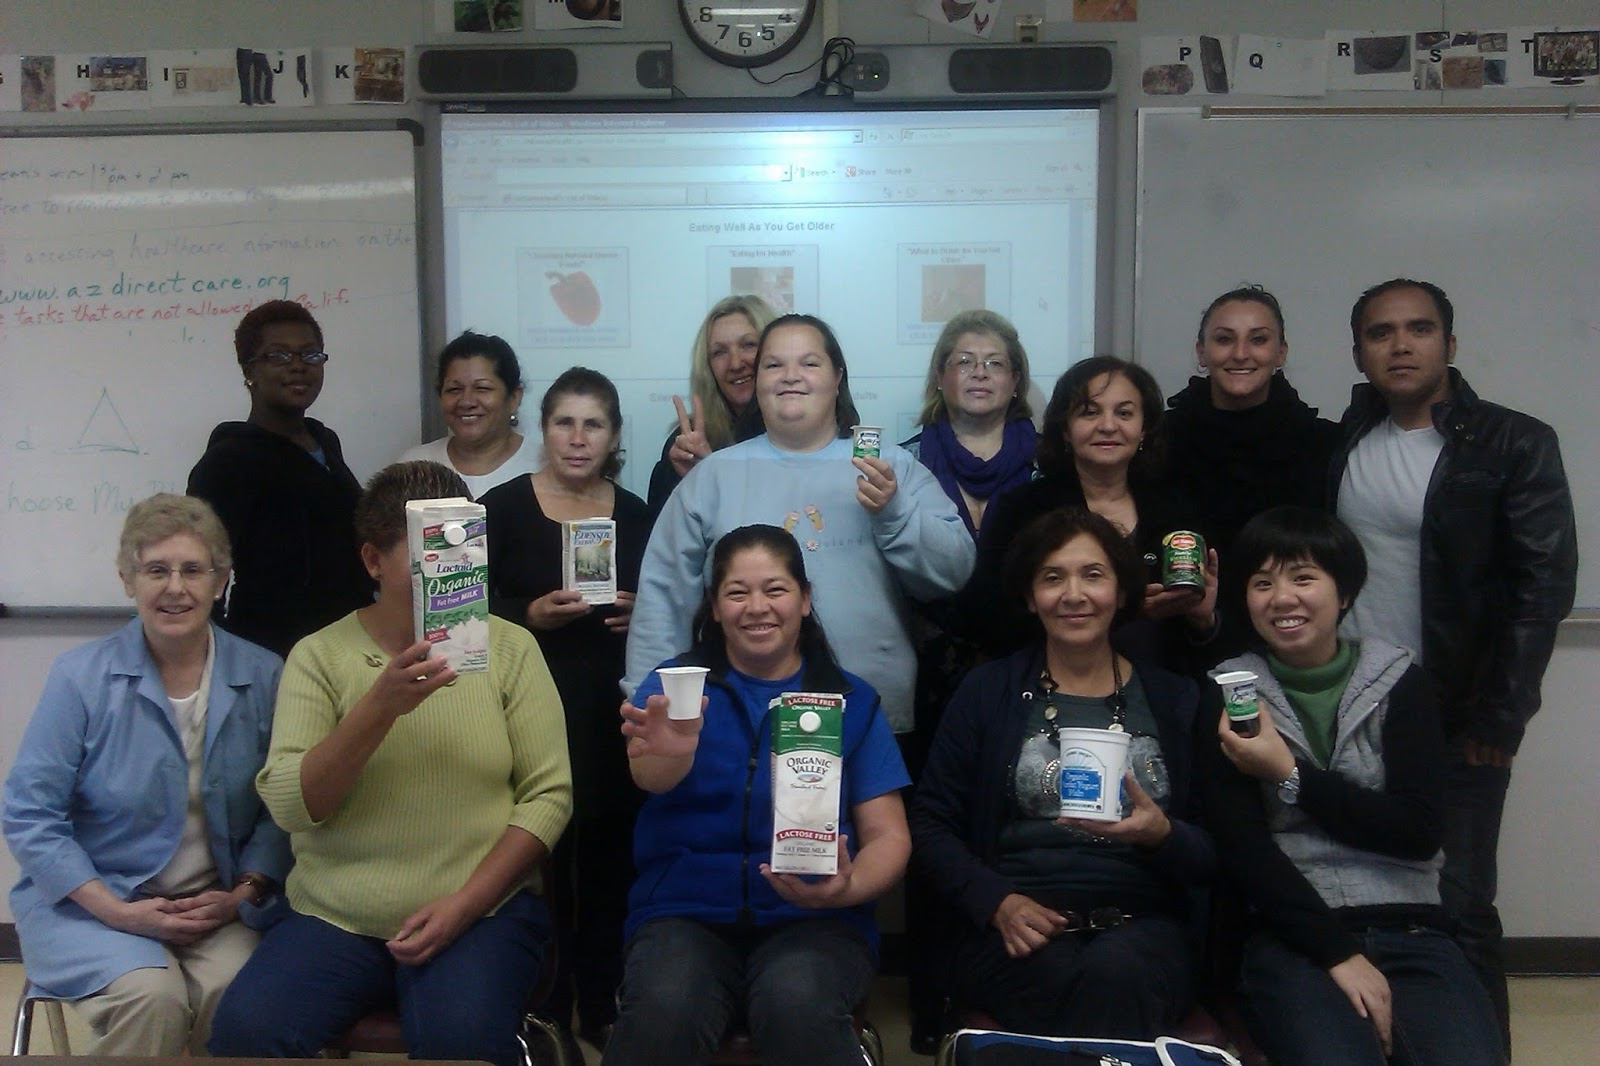 San Mateo Adult School Home Care Training Class